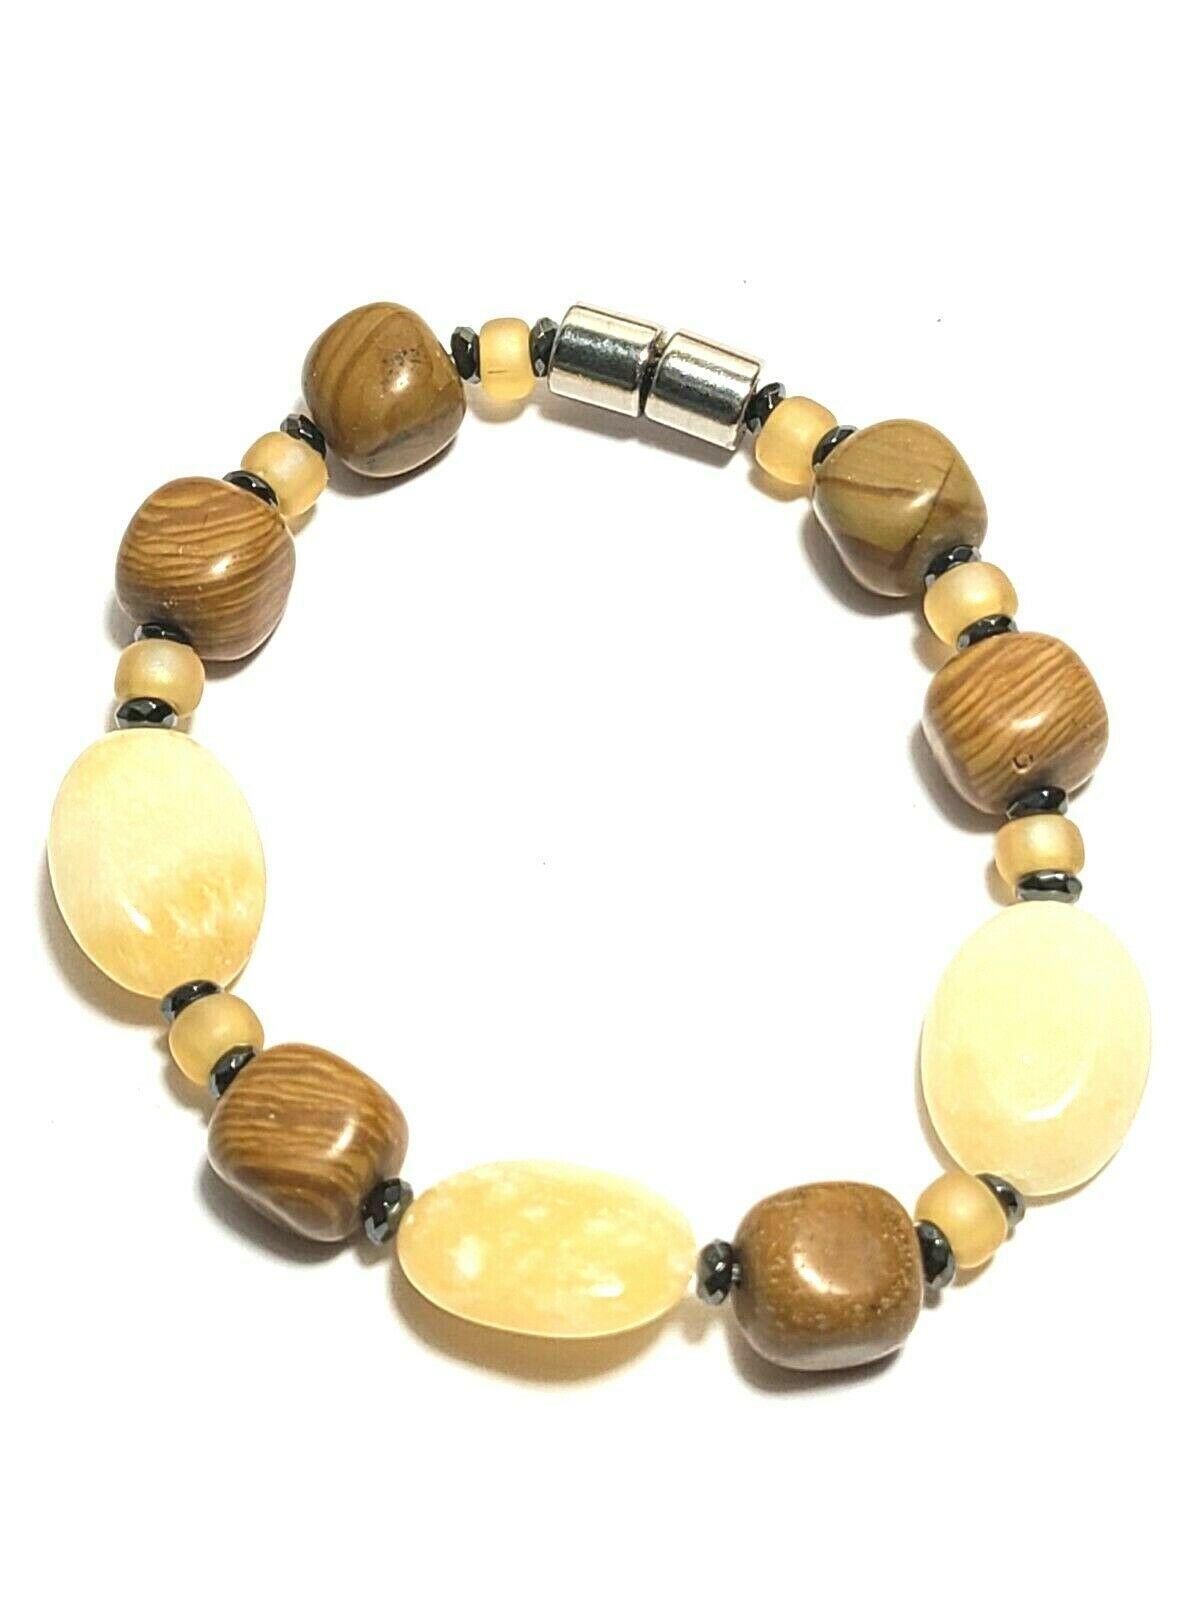 Beaded Bracelet Magnetic Hematite Clasp Single Strand   7.5 Inch   (MAG-017)